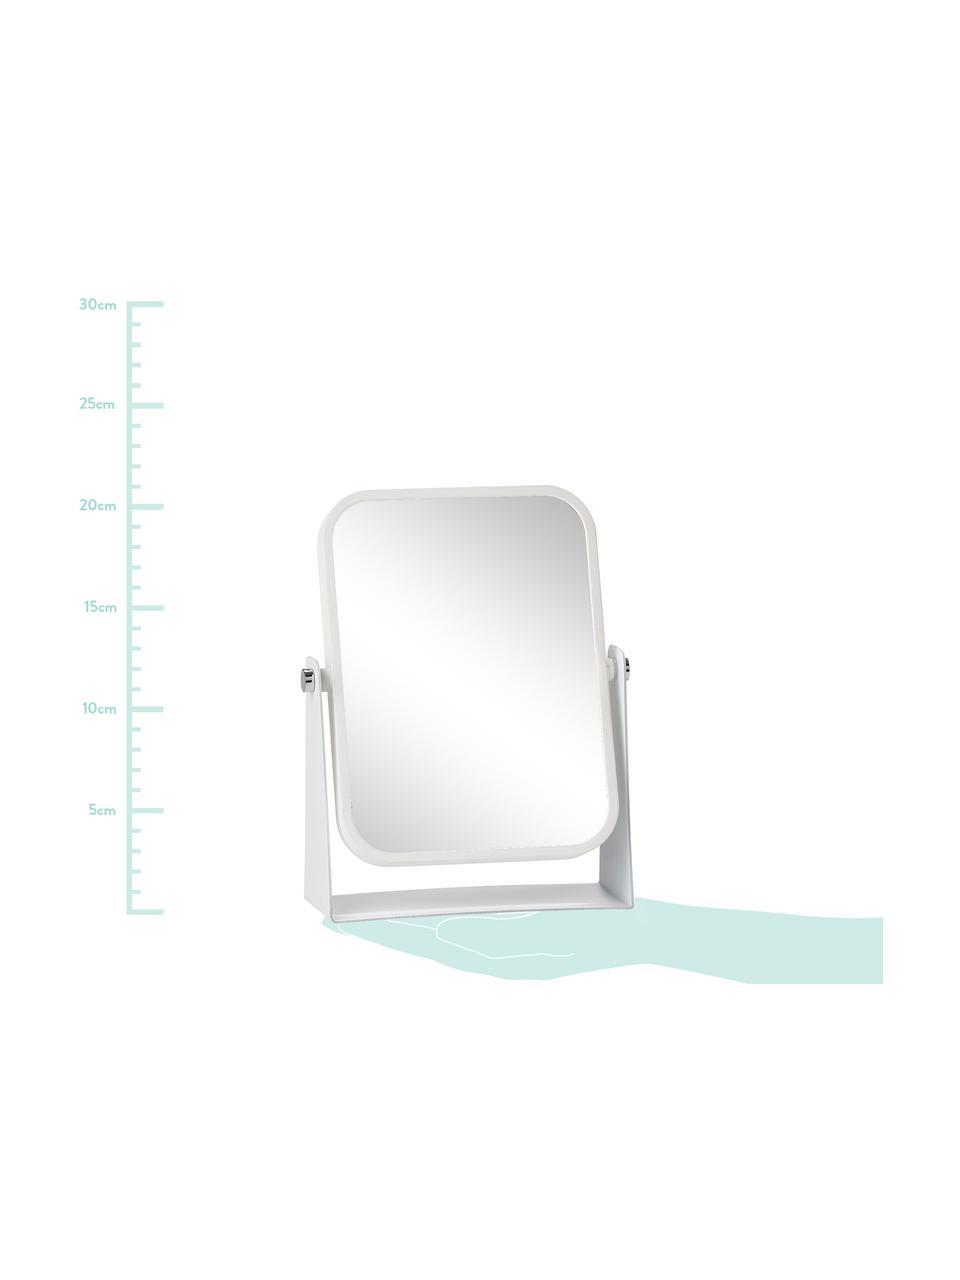 Kosmetické zrcadlo Aurora se zvětšením, Rám: bílá Plocha zrcadla: zrcadlo